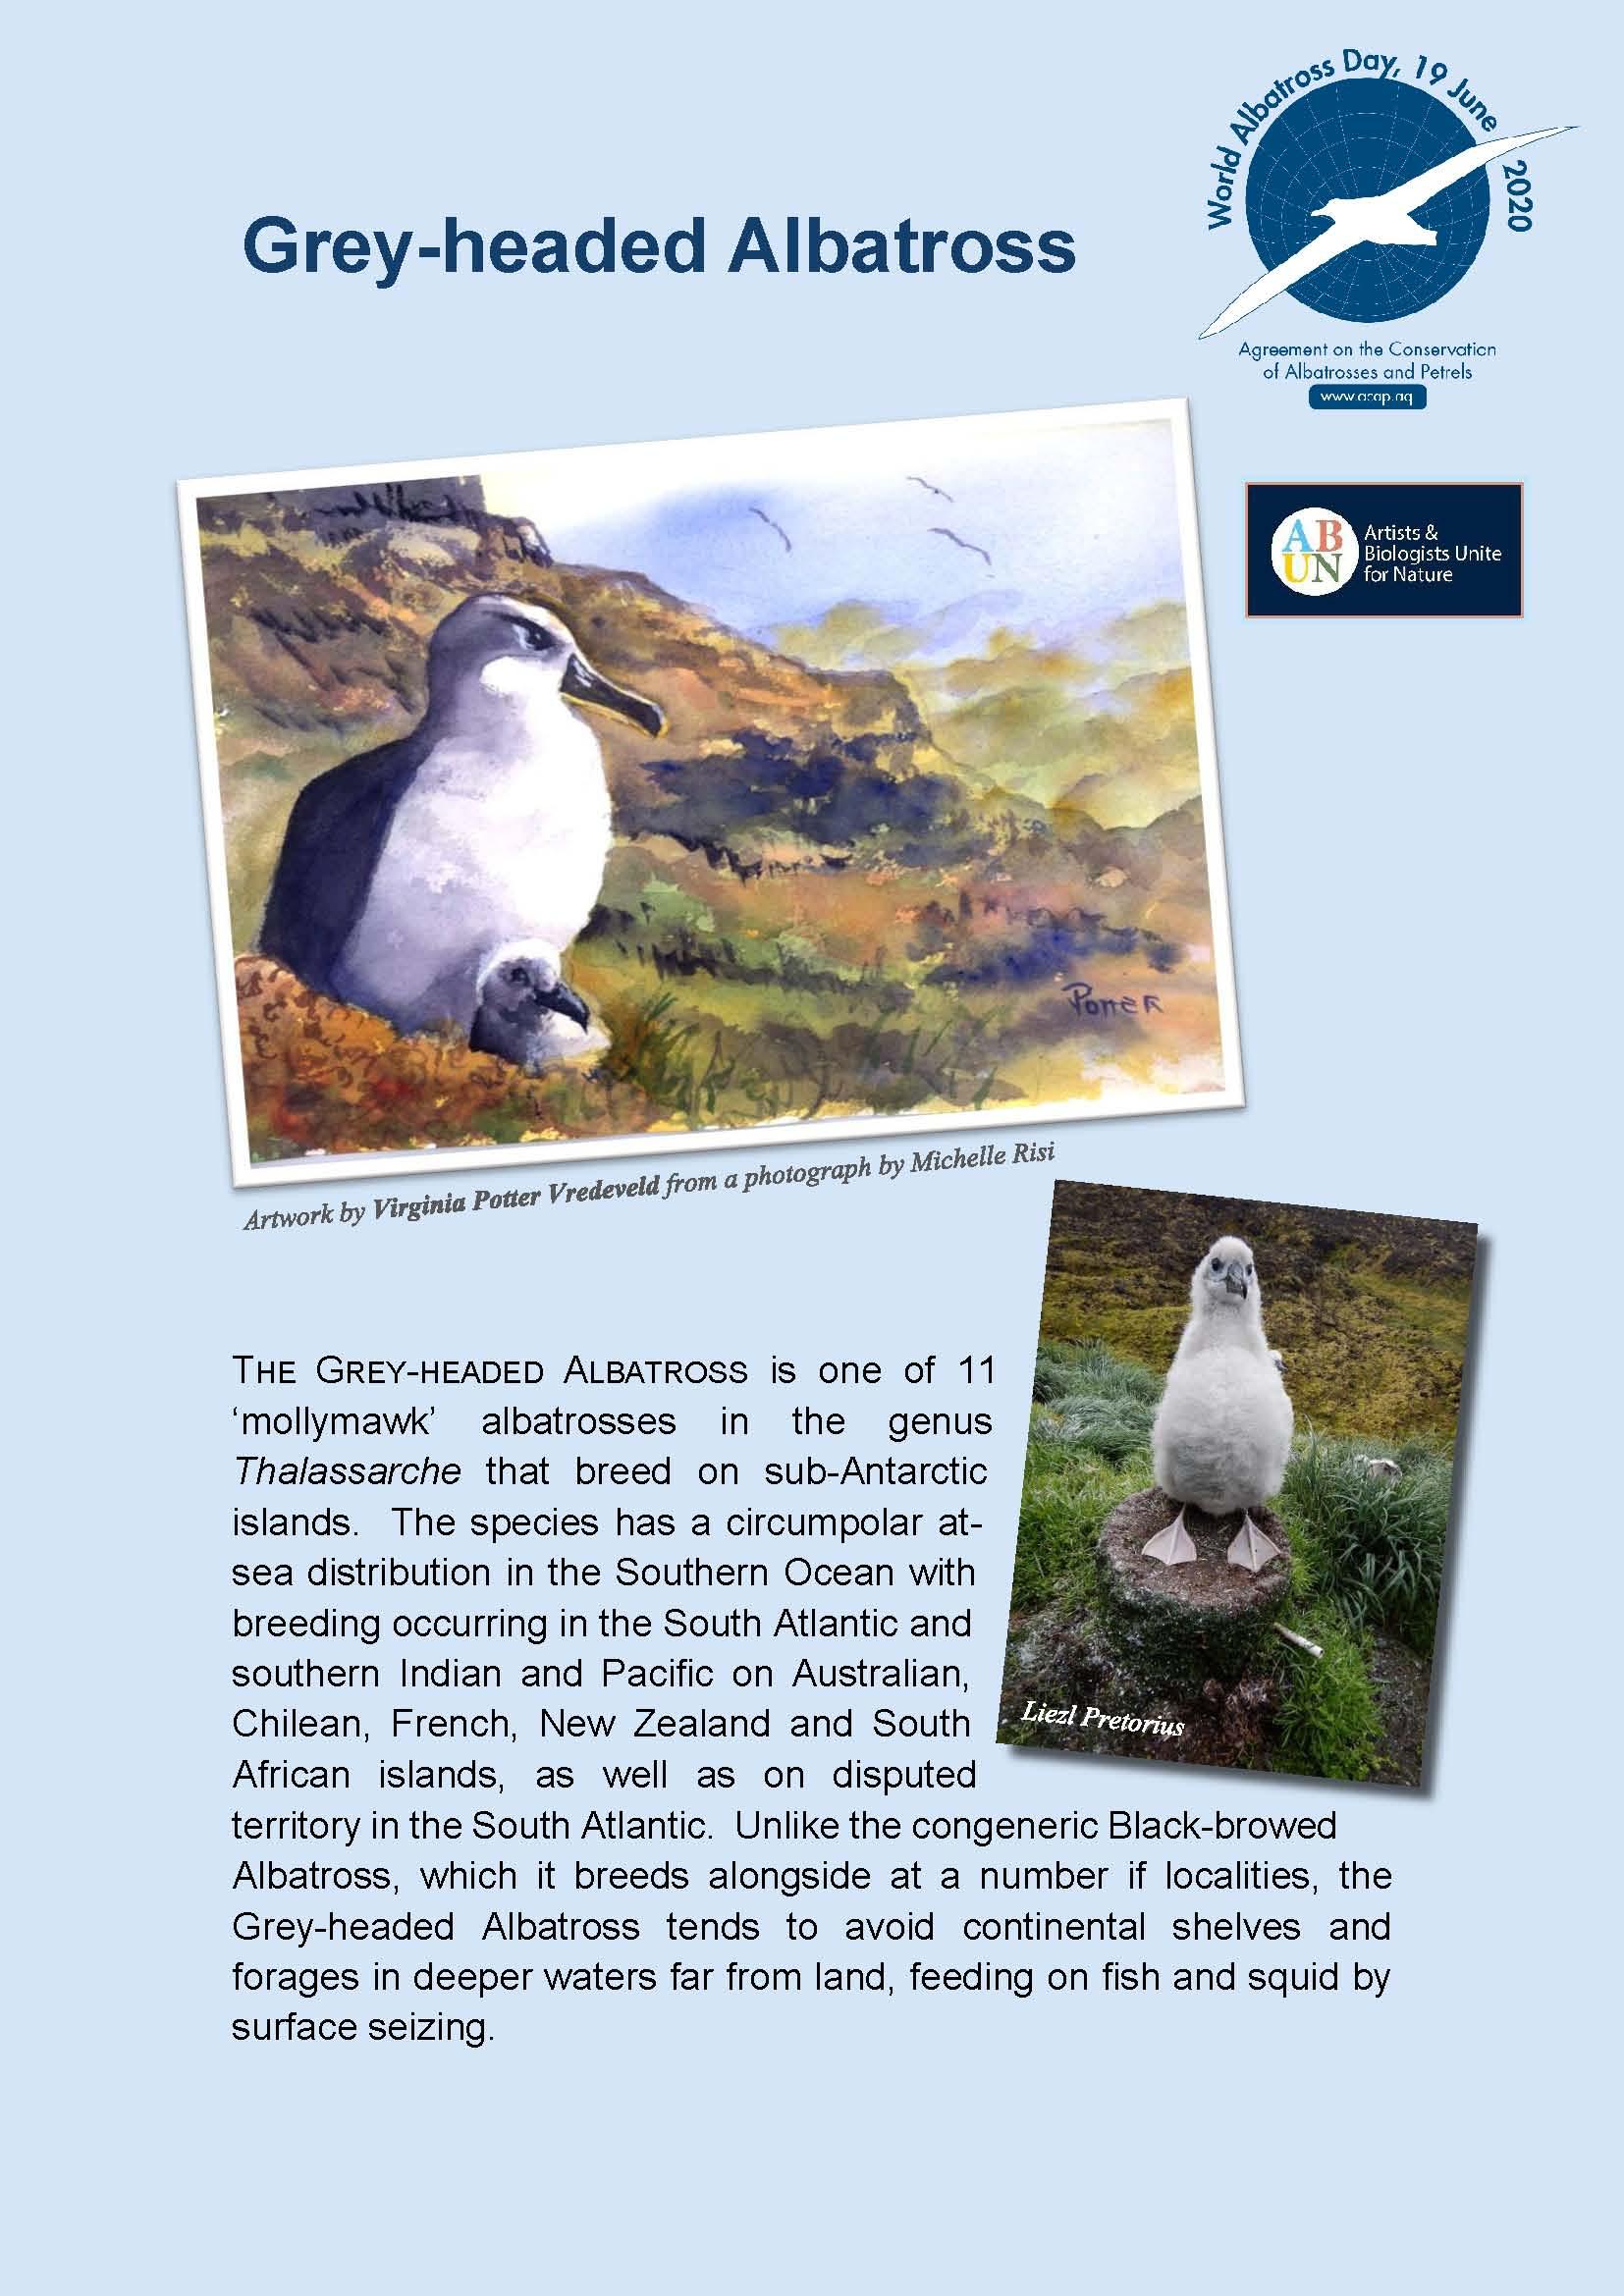 Albatros de cabeza gris